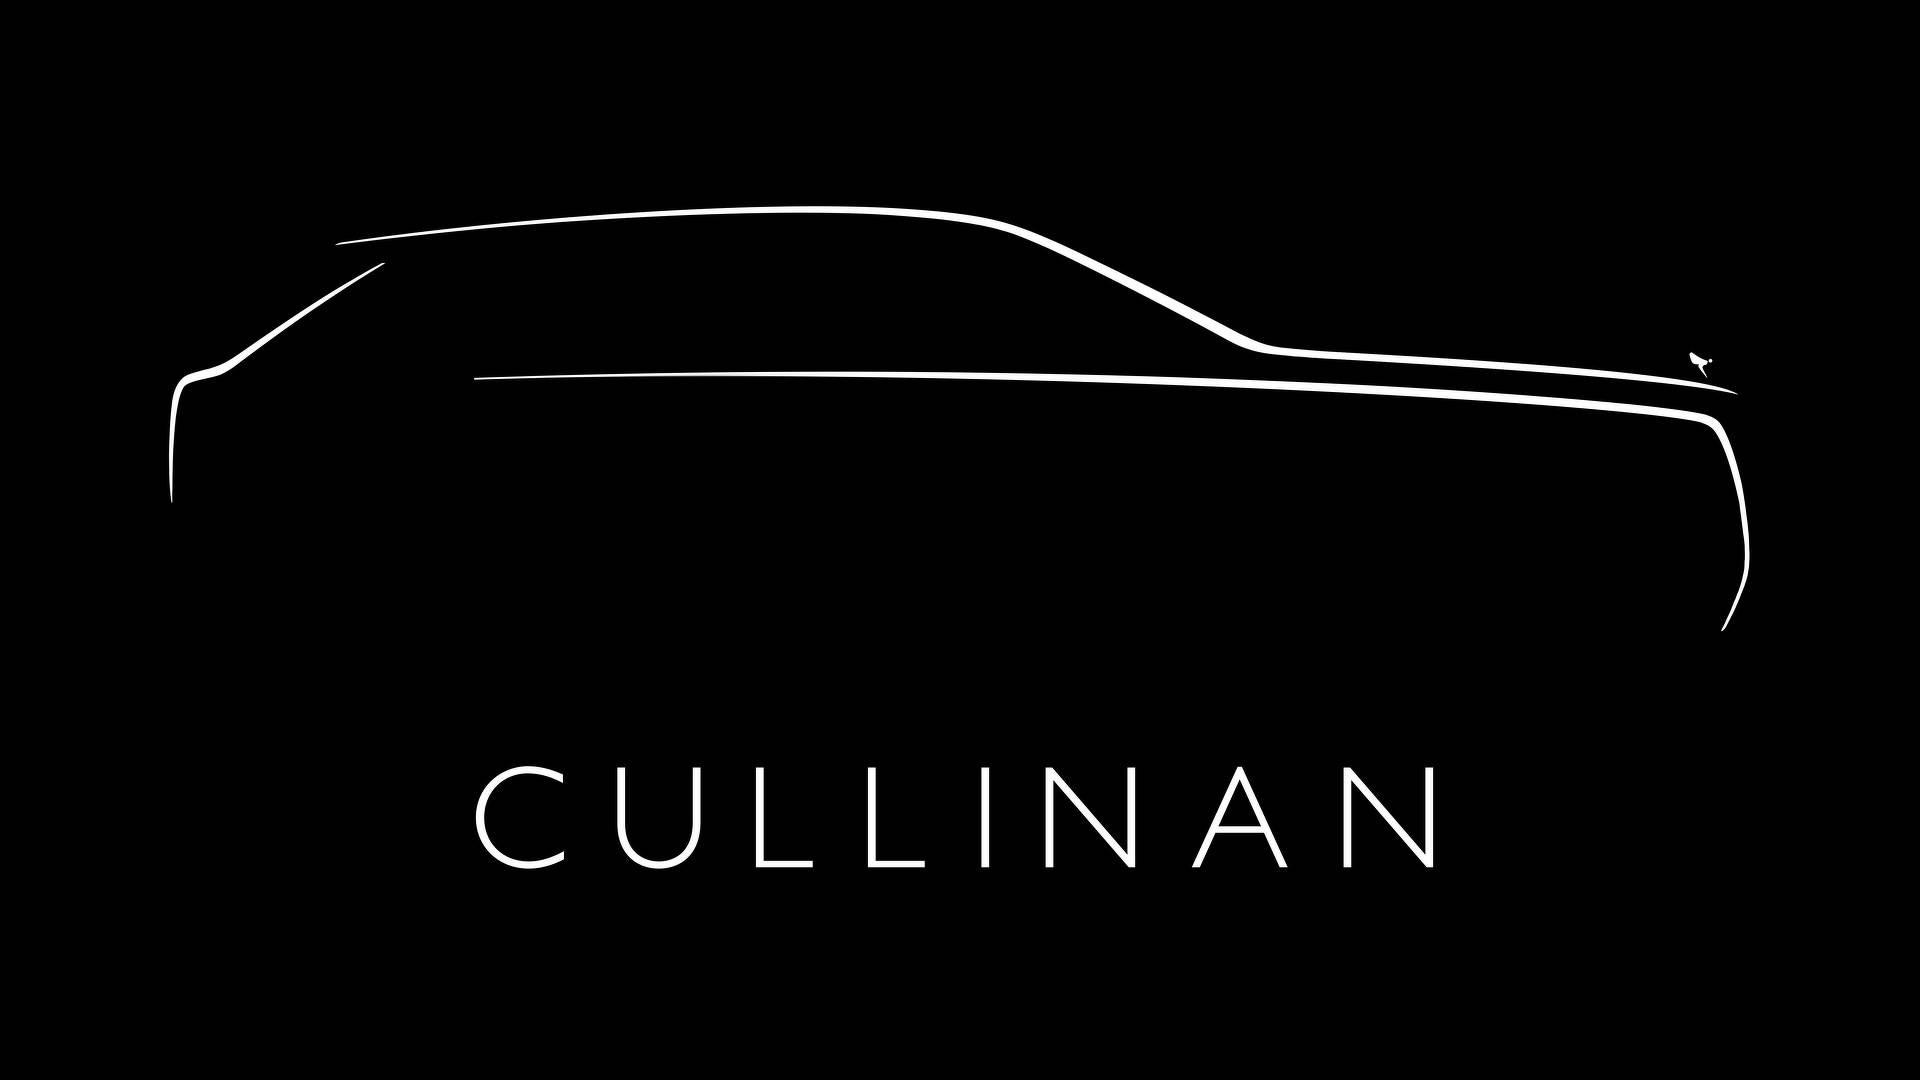 2019-rolls-royce-cullinan-teaser (4)